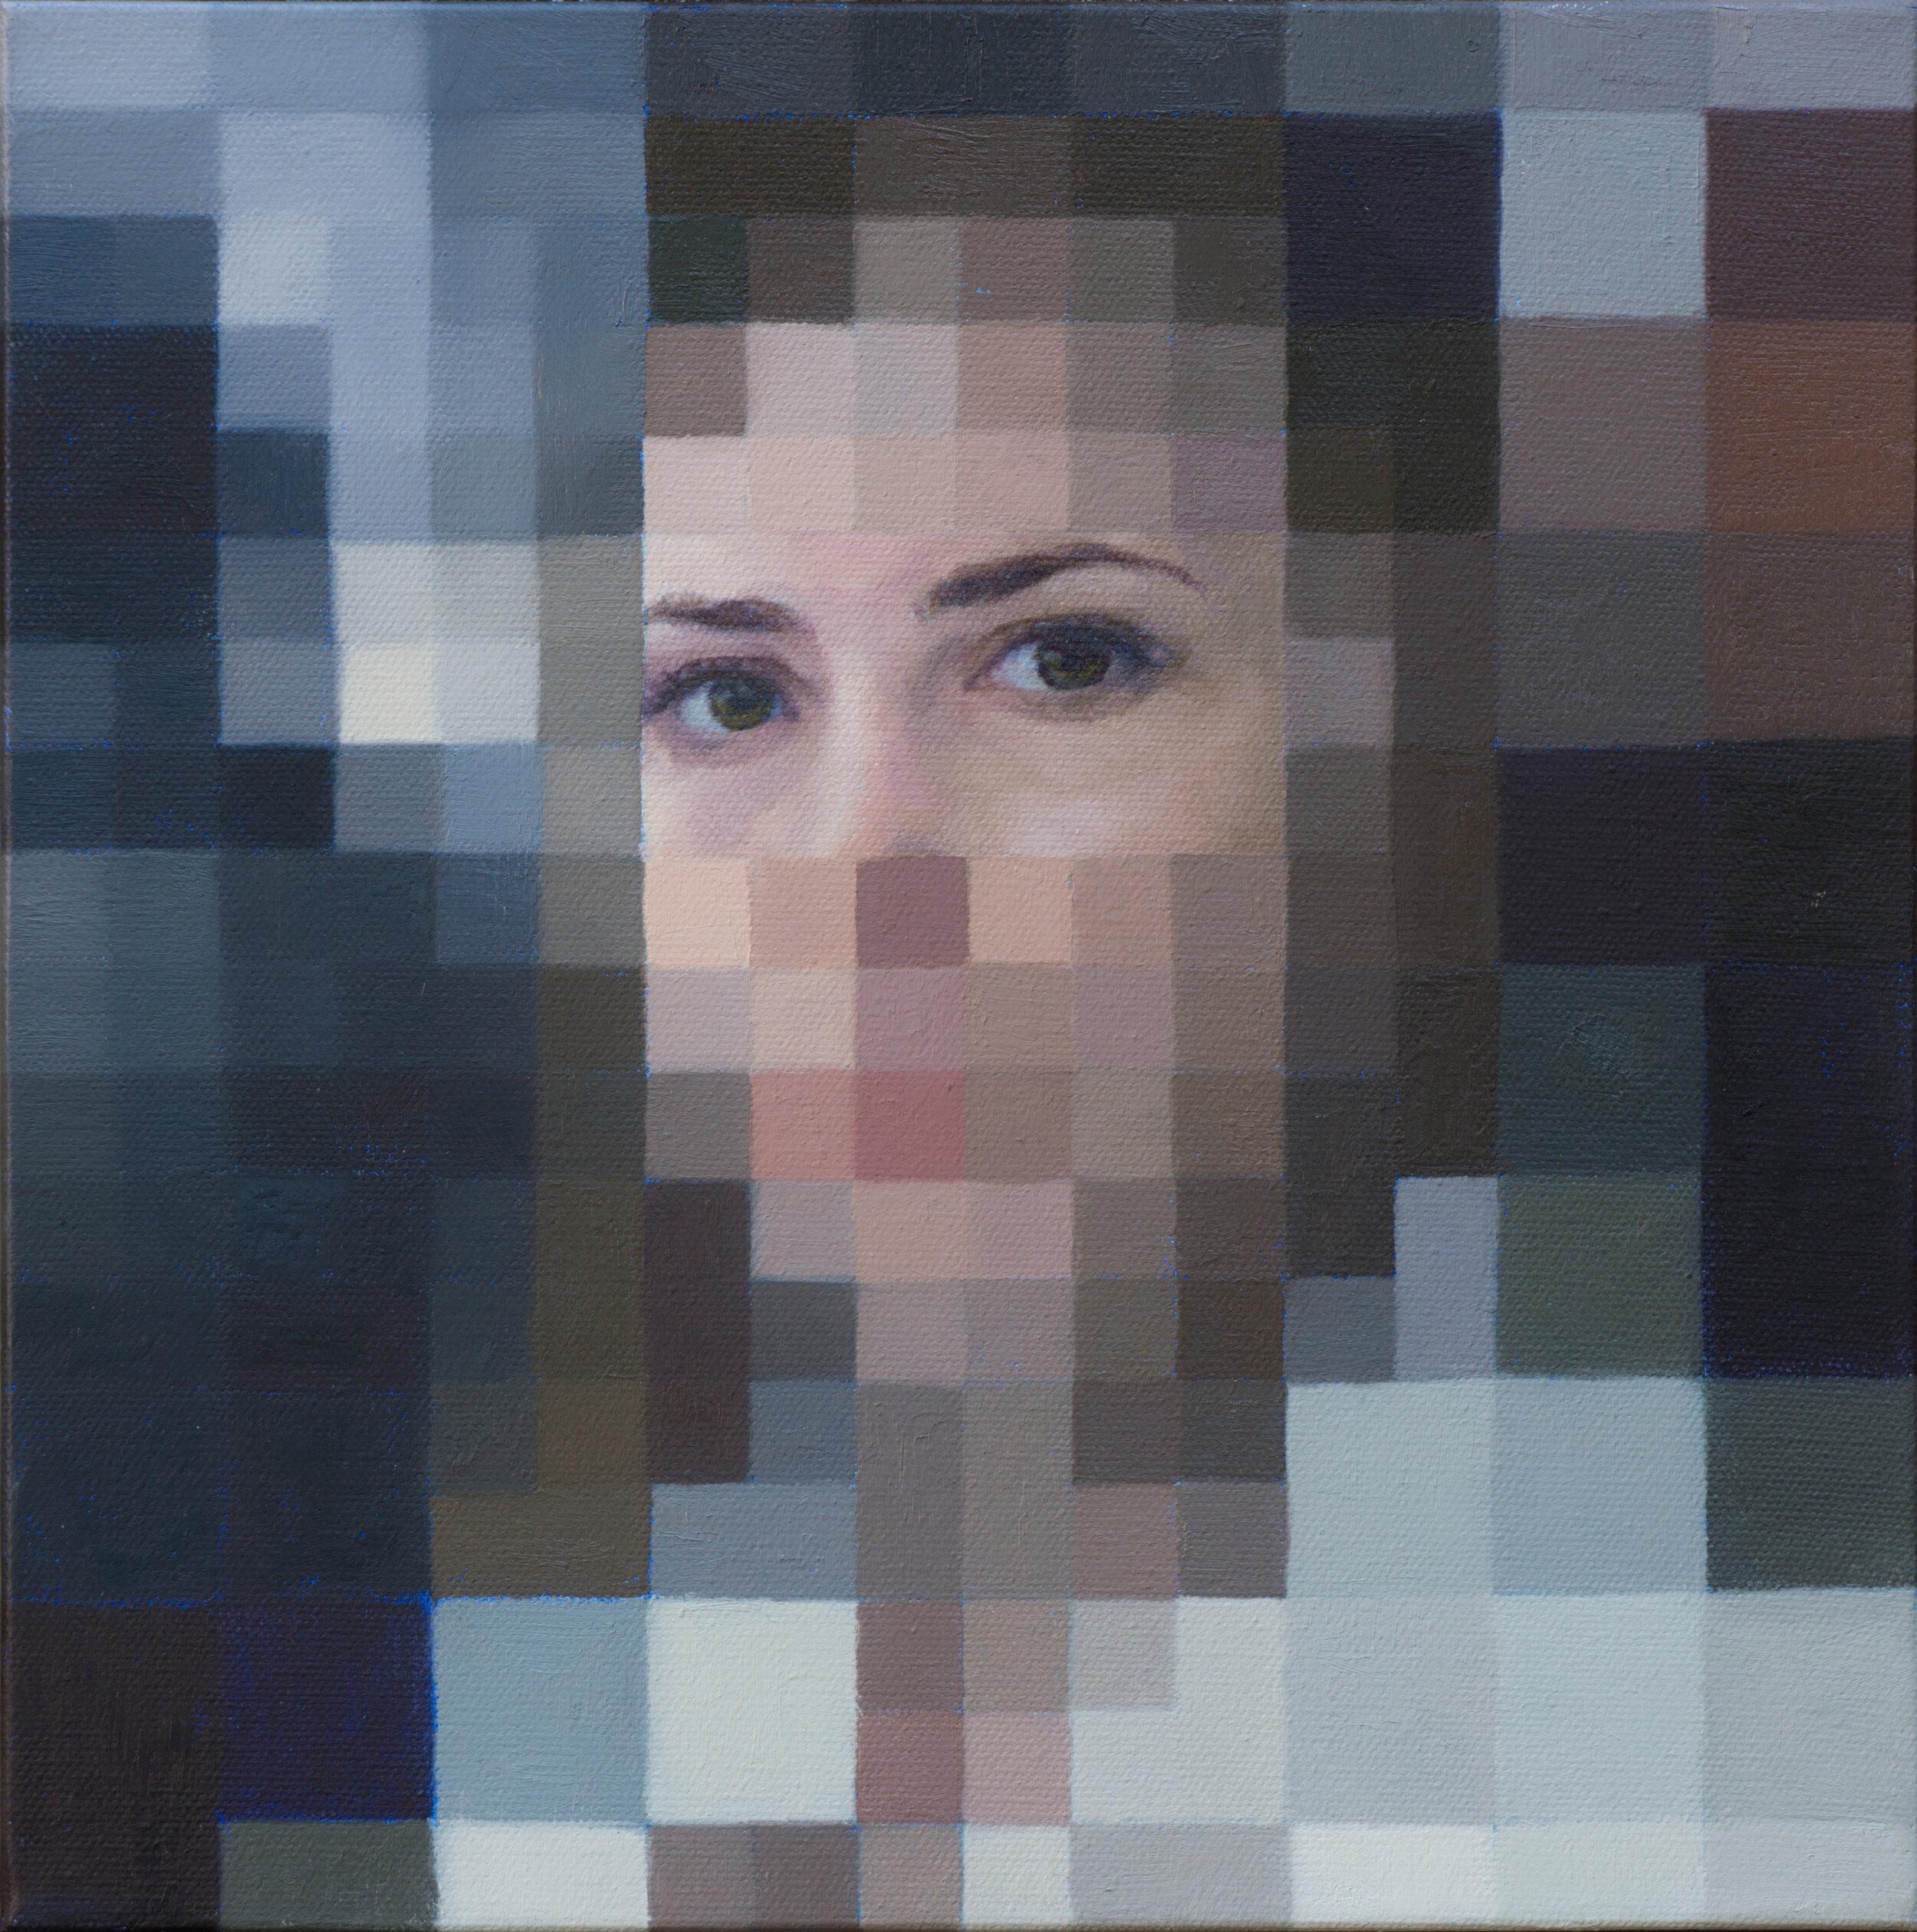 Catherine_Malloy_Digital_Persona_4_2018.jpg